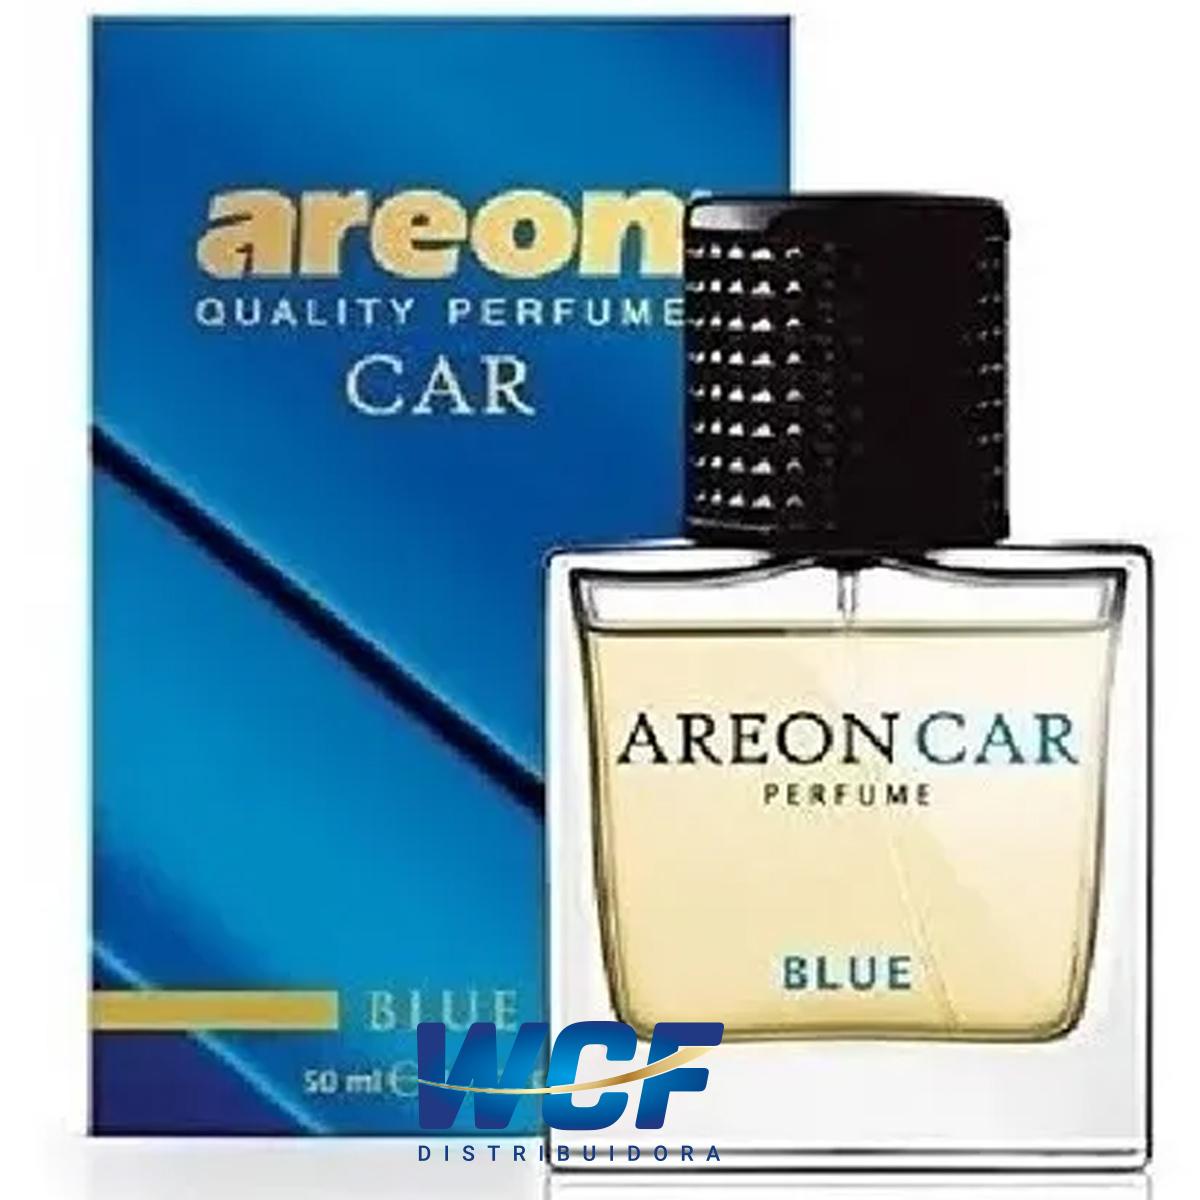 AREON PERFUME BLUE AZUL 50 ML